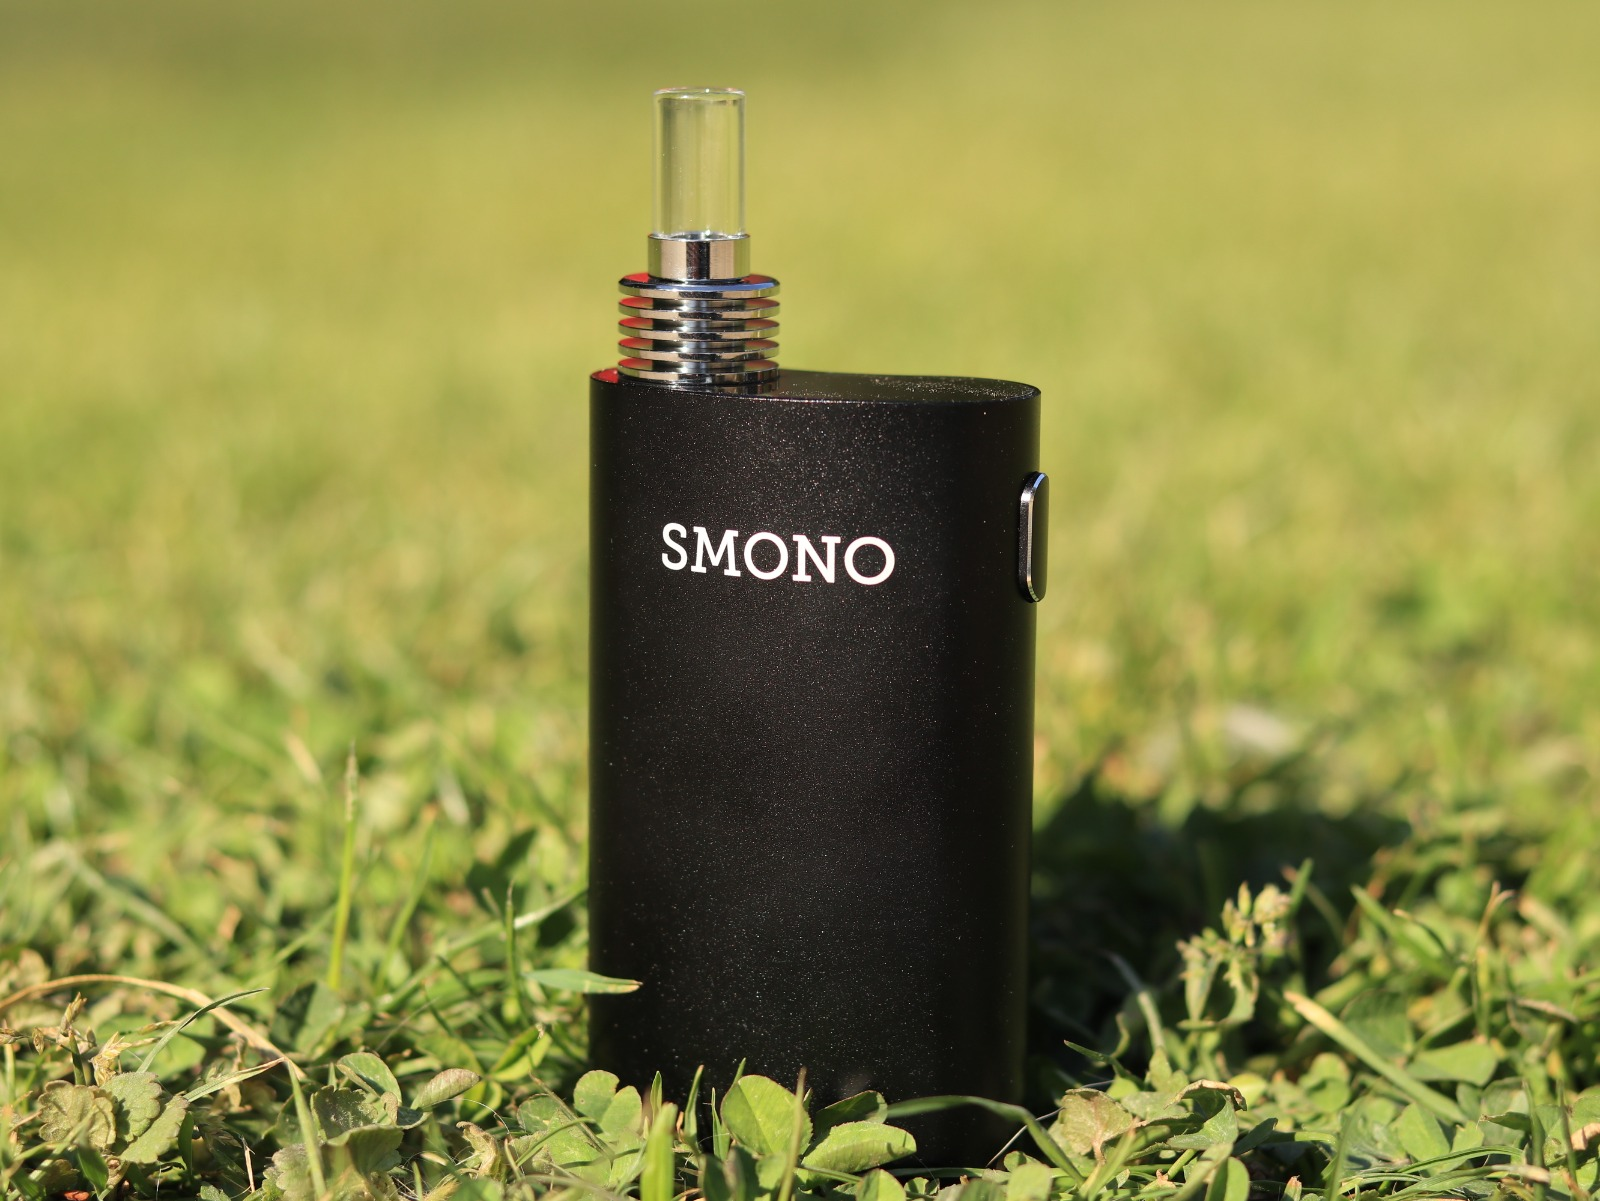 Smono 4 Vaporizer Test Bild 1